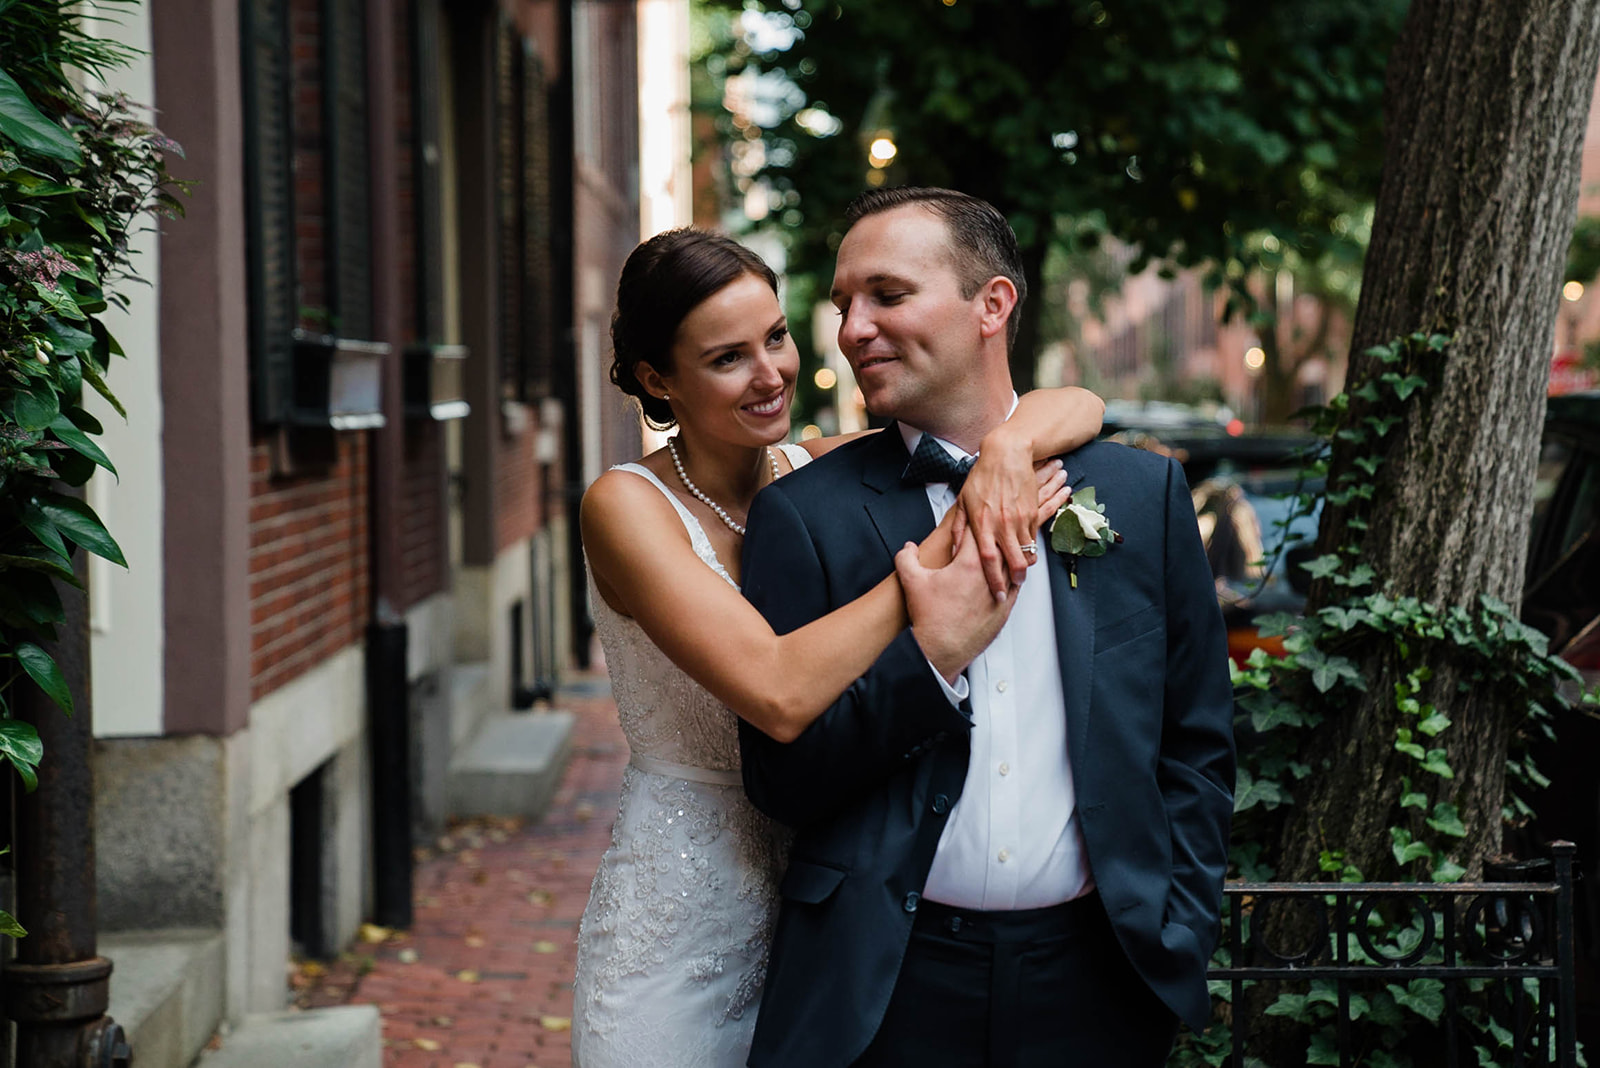 wedding-flowers-state-room-boston-lesfleurs (8).jpg